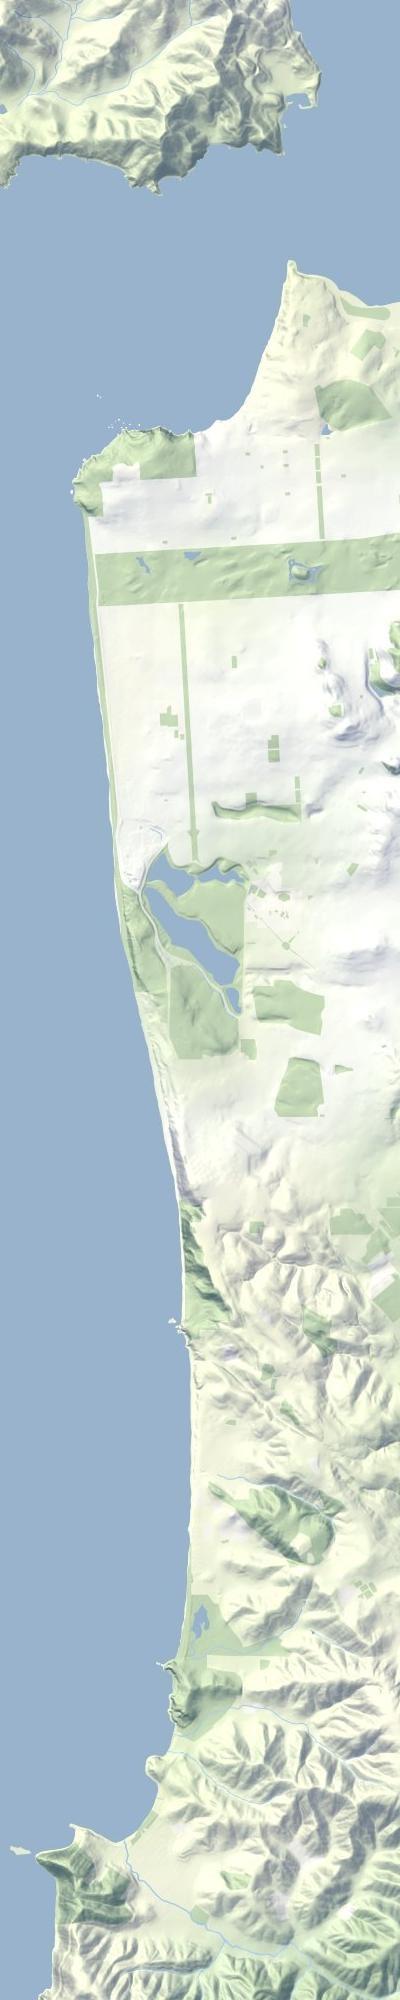 stamen design | Map2Image is live: Launch Maps Stamen Com, Stamen Design